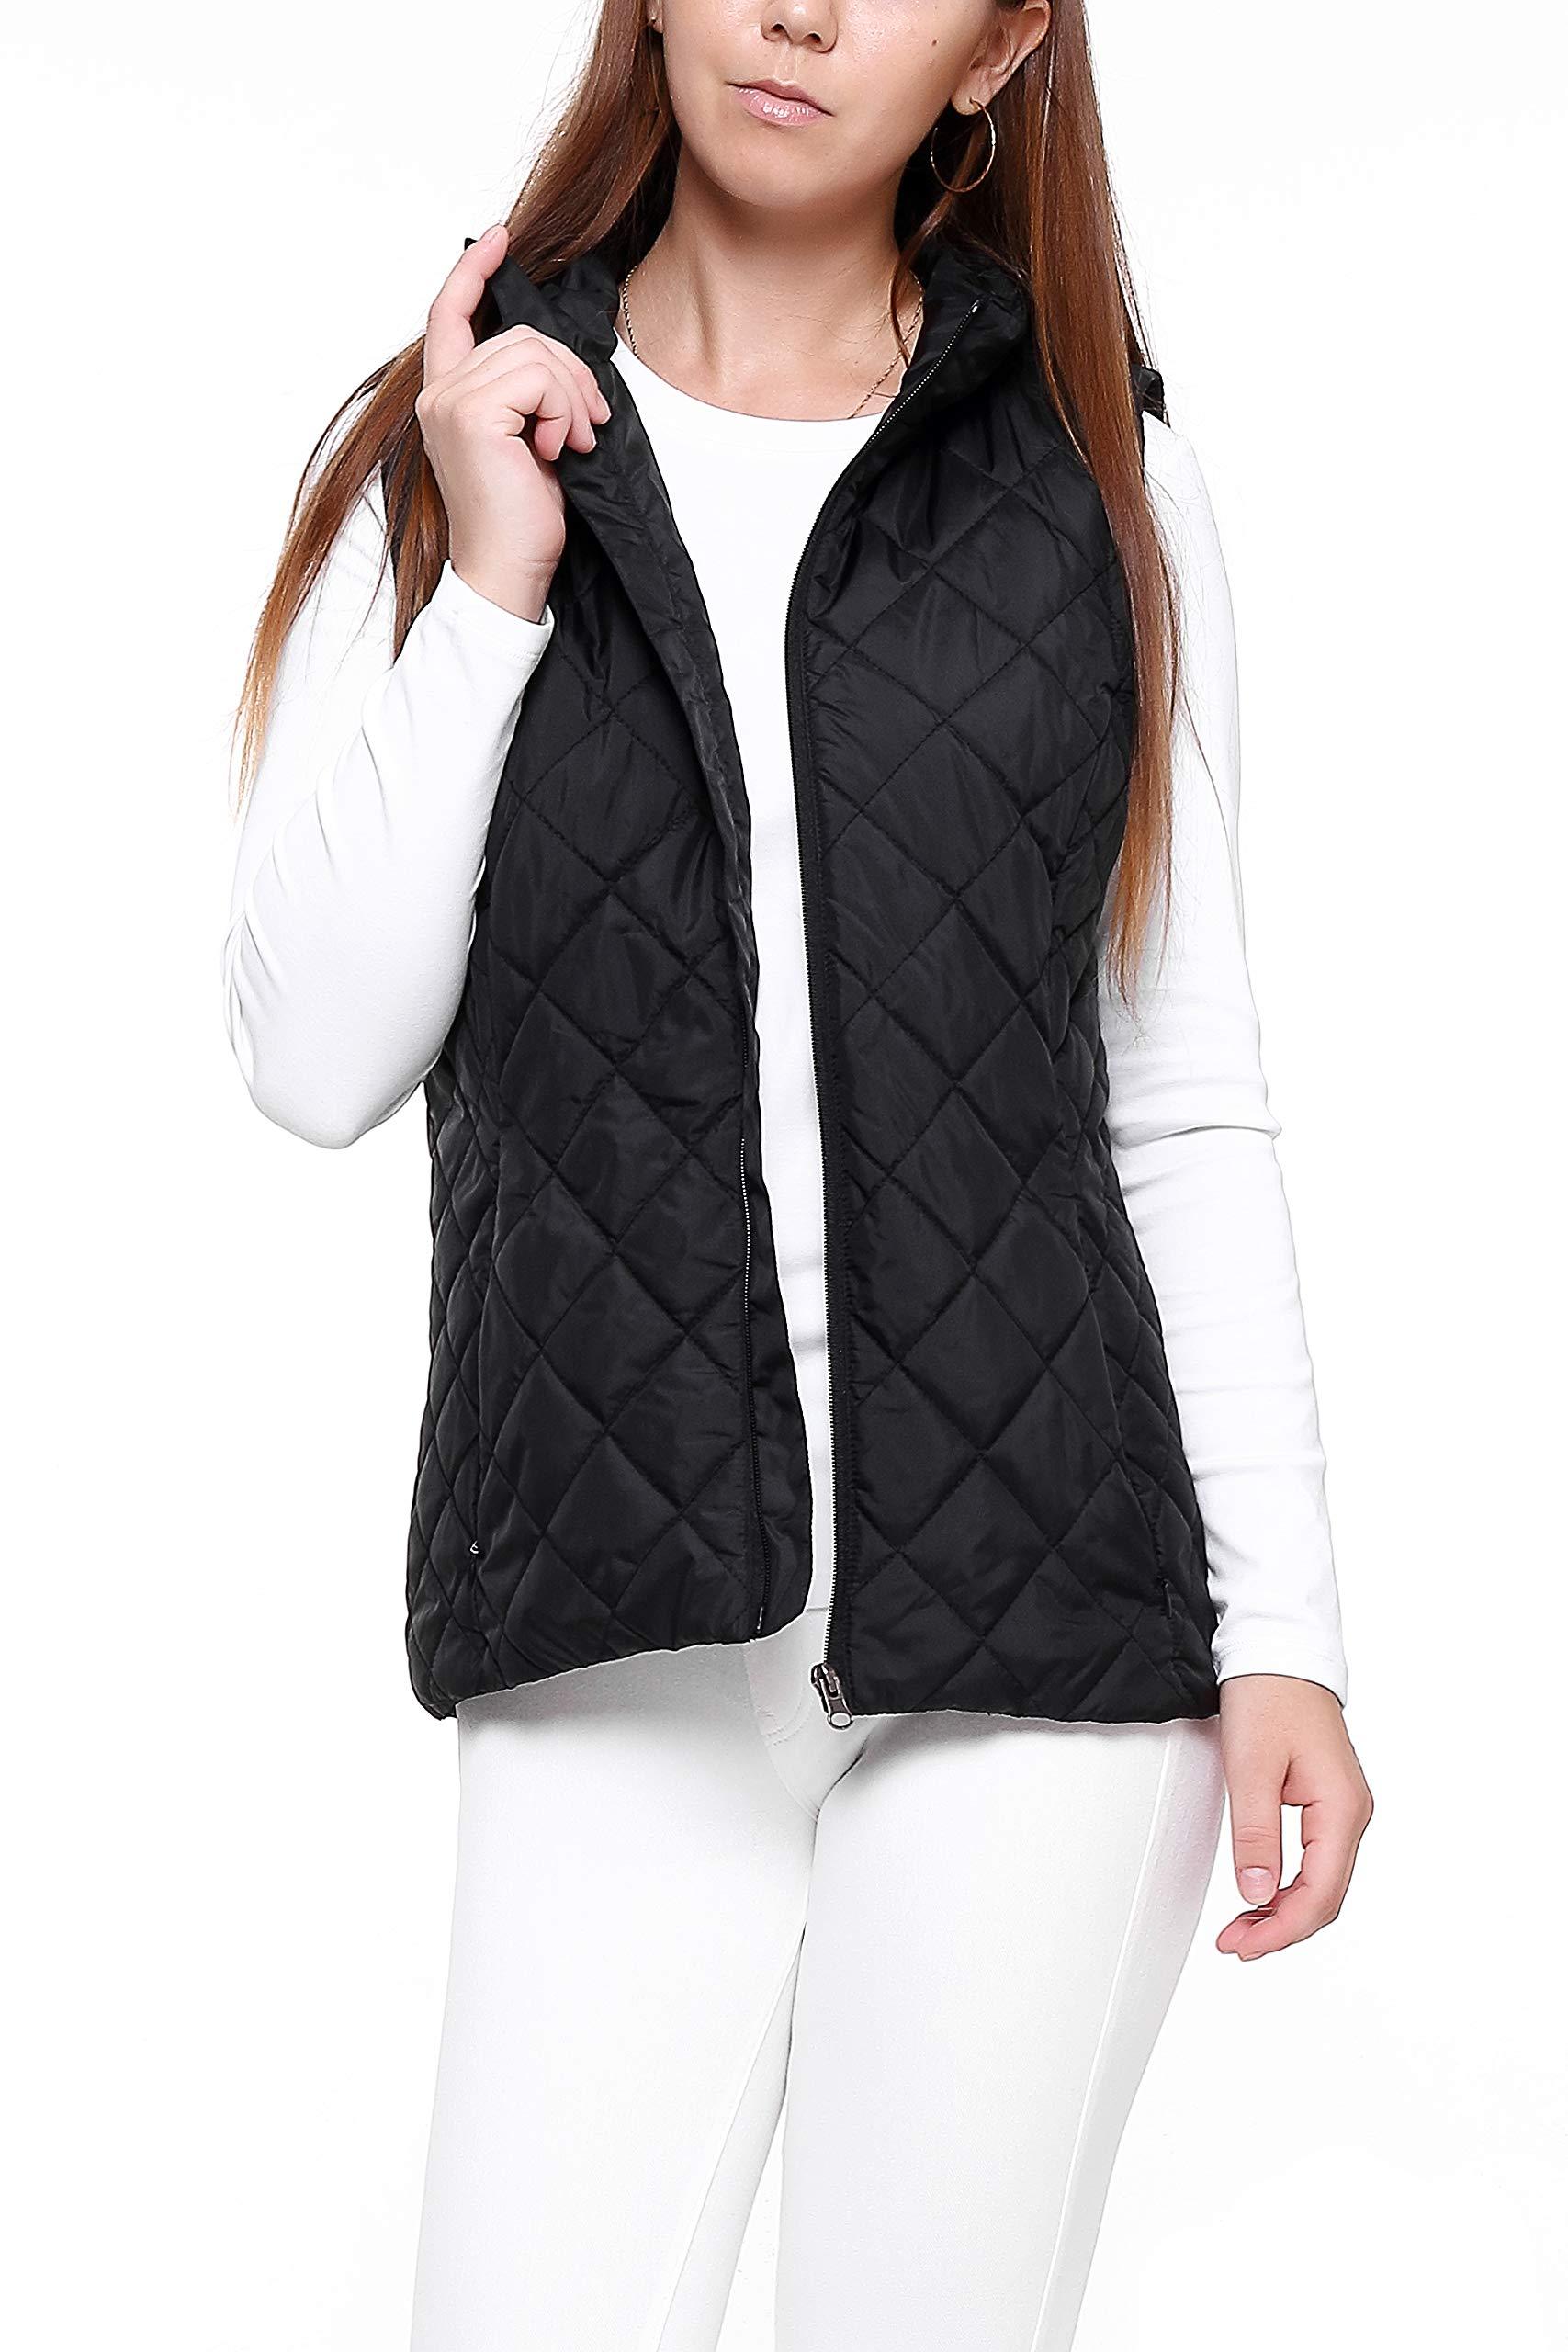 More Golooper Lightweight Quilted Women's Vest (Black, M)